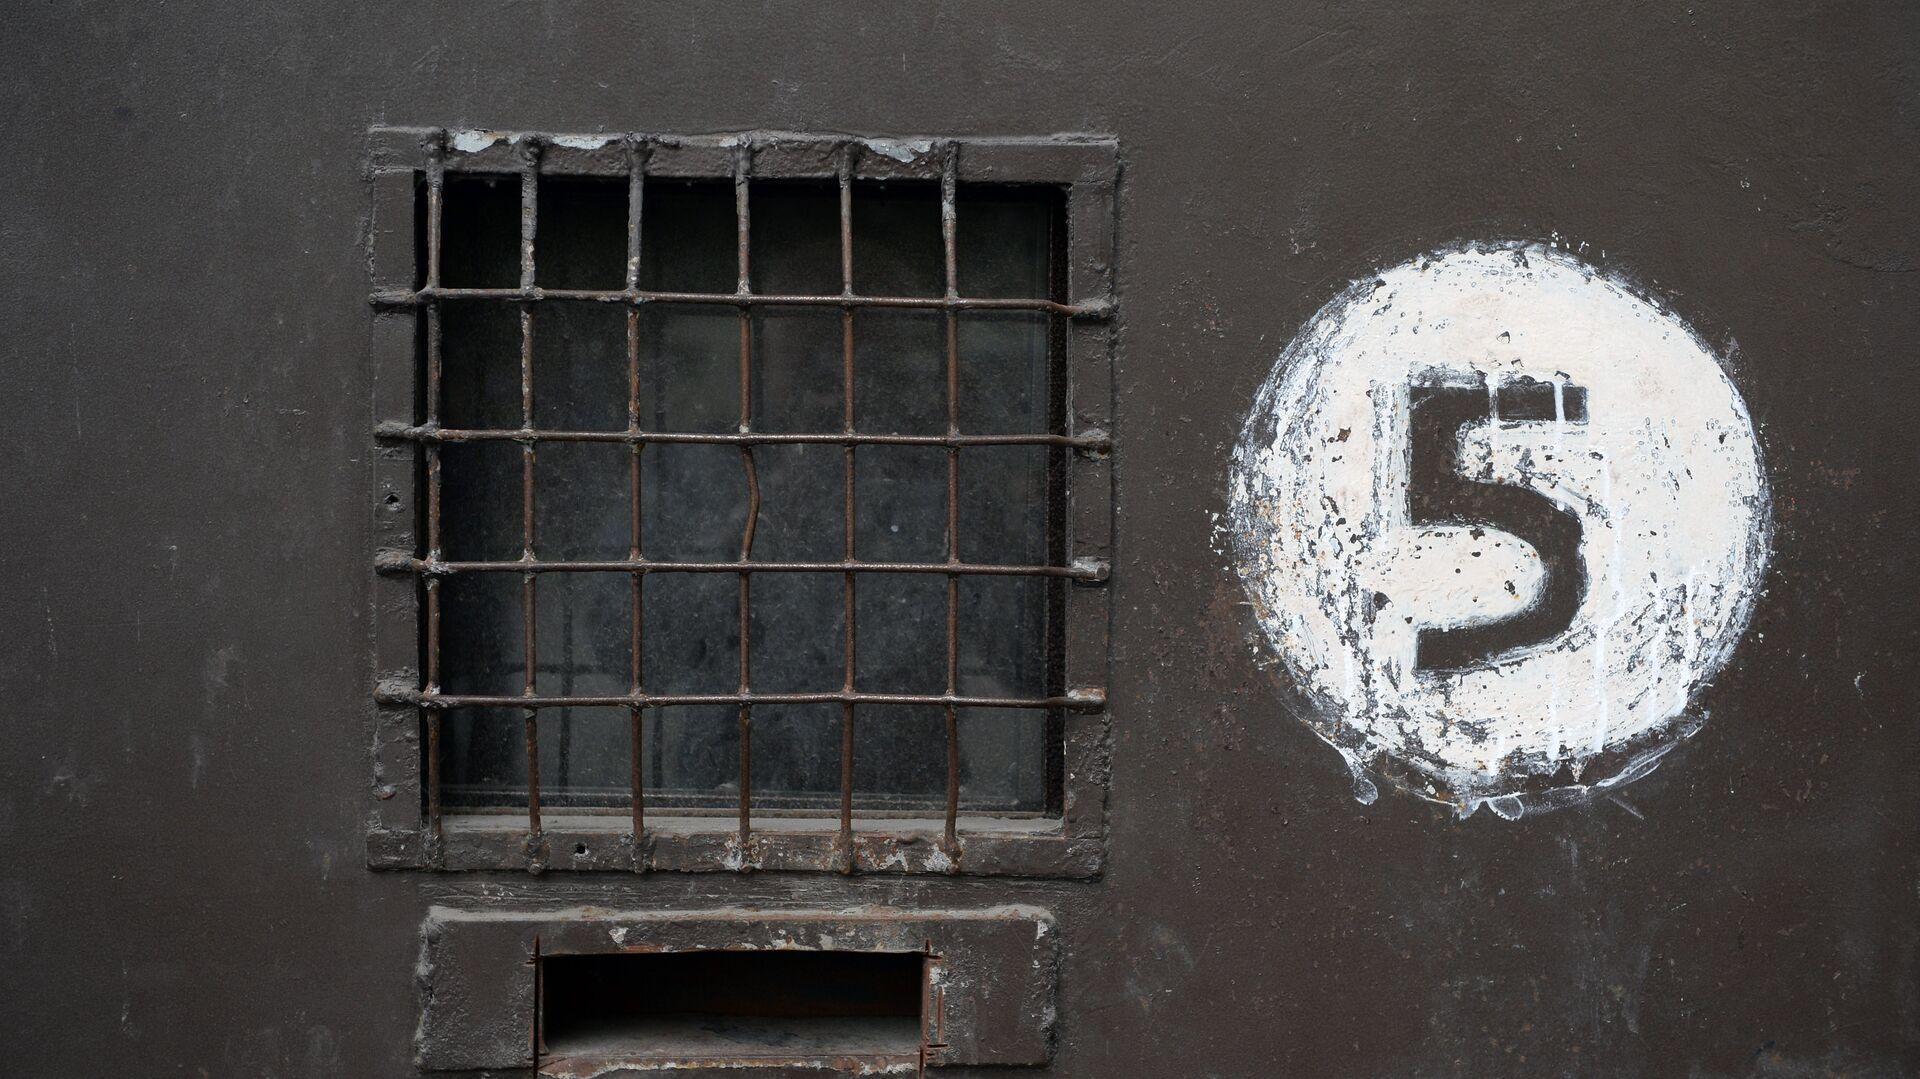 Las rejas de la cárcel (imagen referencial) - Sputnik Mundo, 1920, 25.07.2021